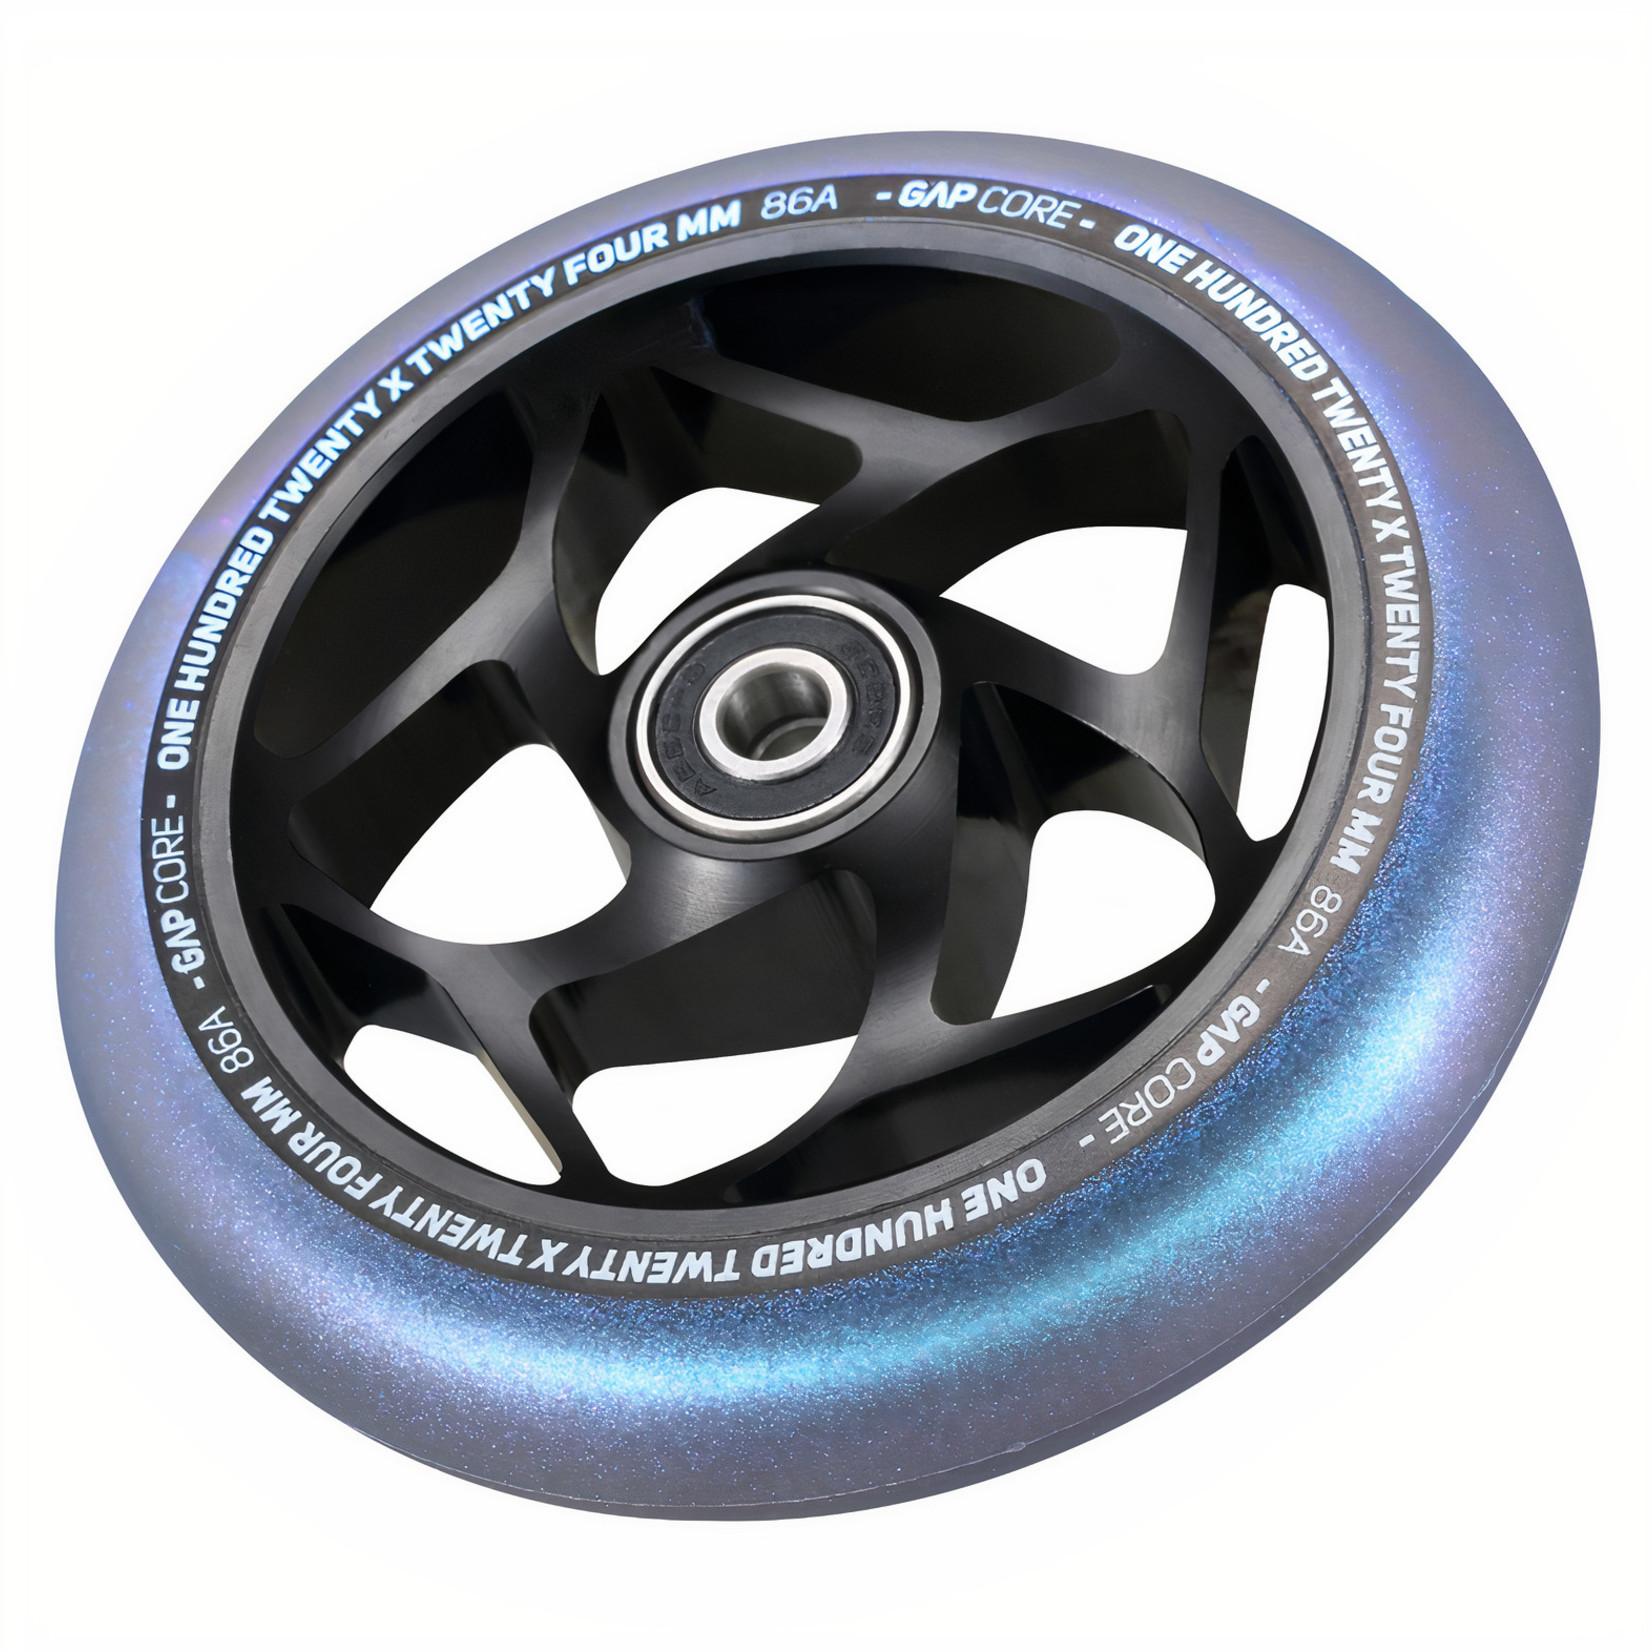 Envy Envy - 120mm Gap Core Wheel SINGLE - Black / Galaxy